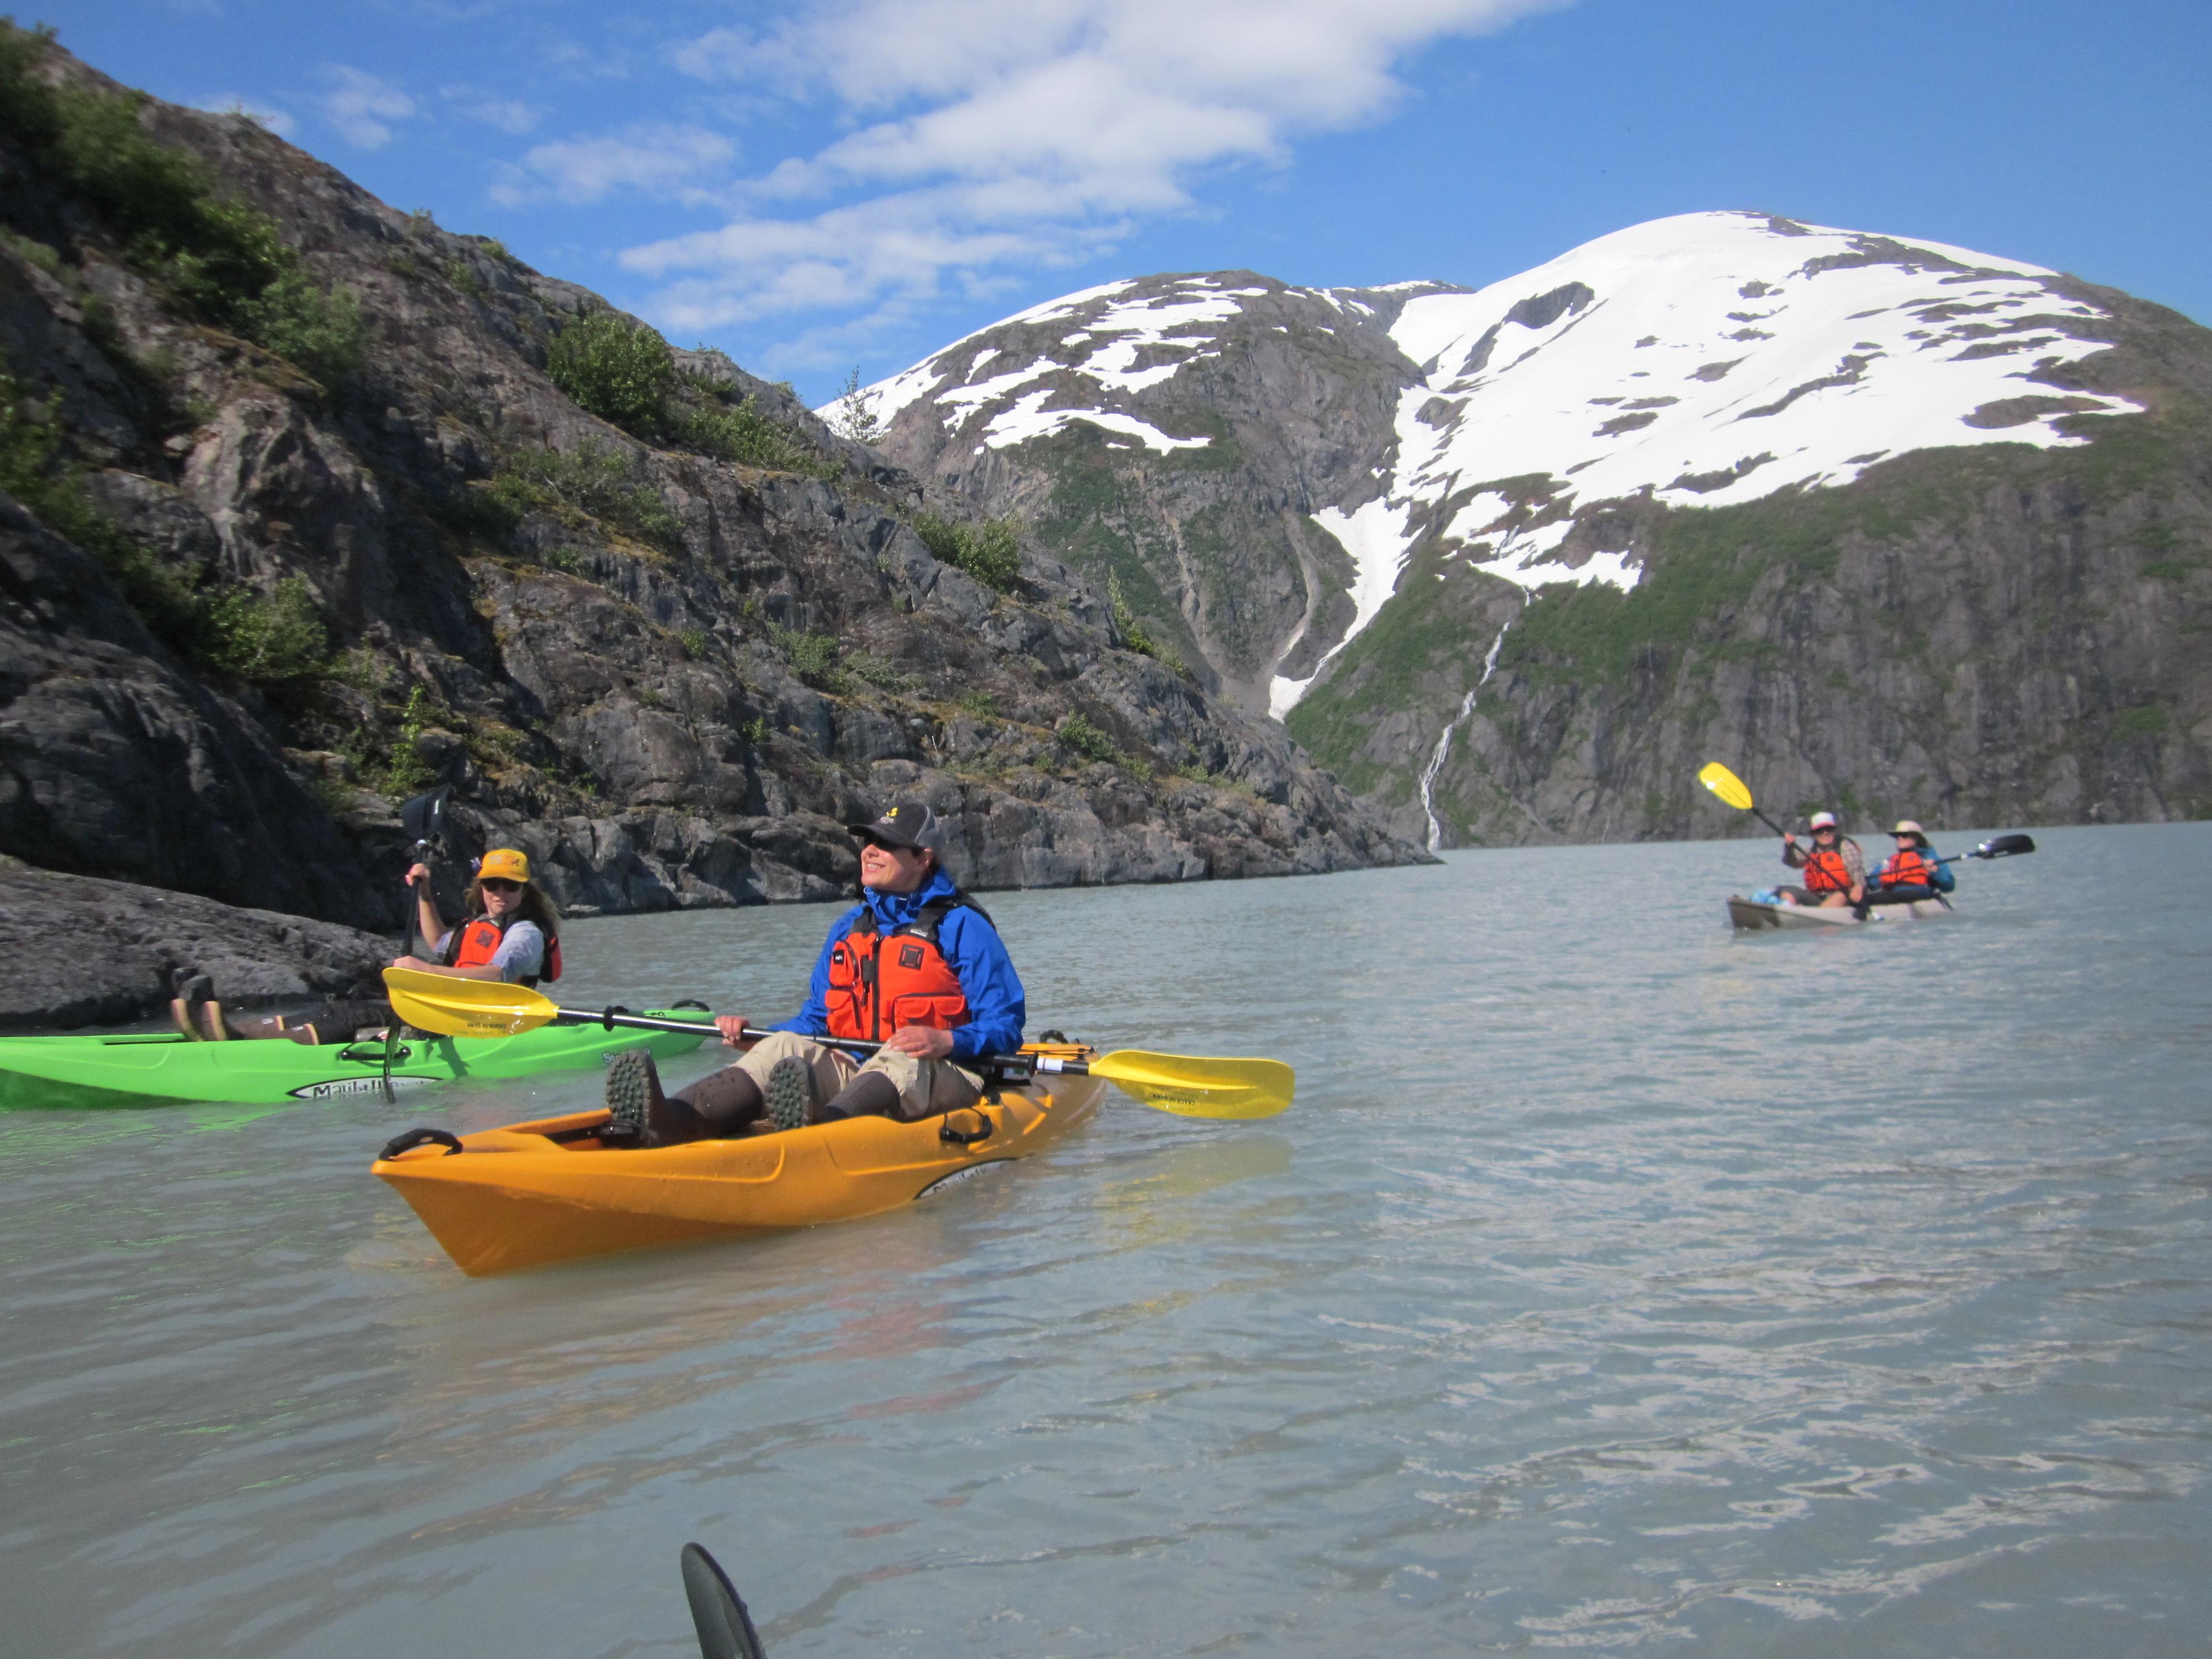 Alaska matanuska susitna county skwentna - Featured